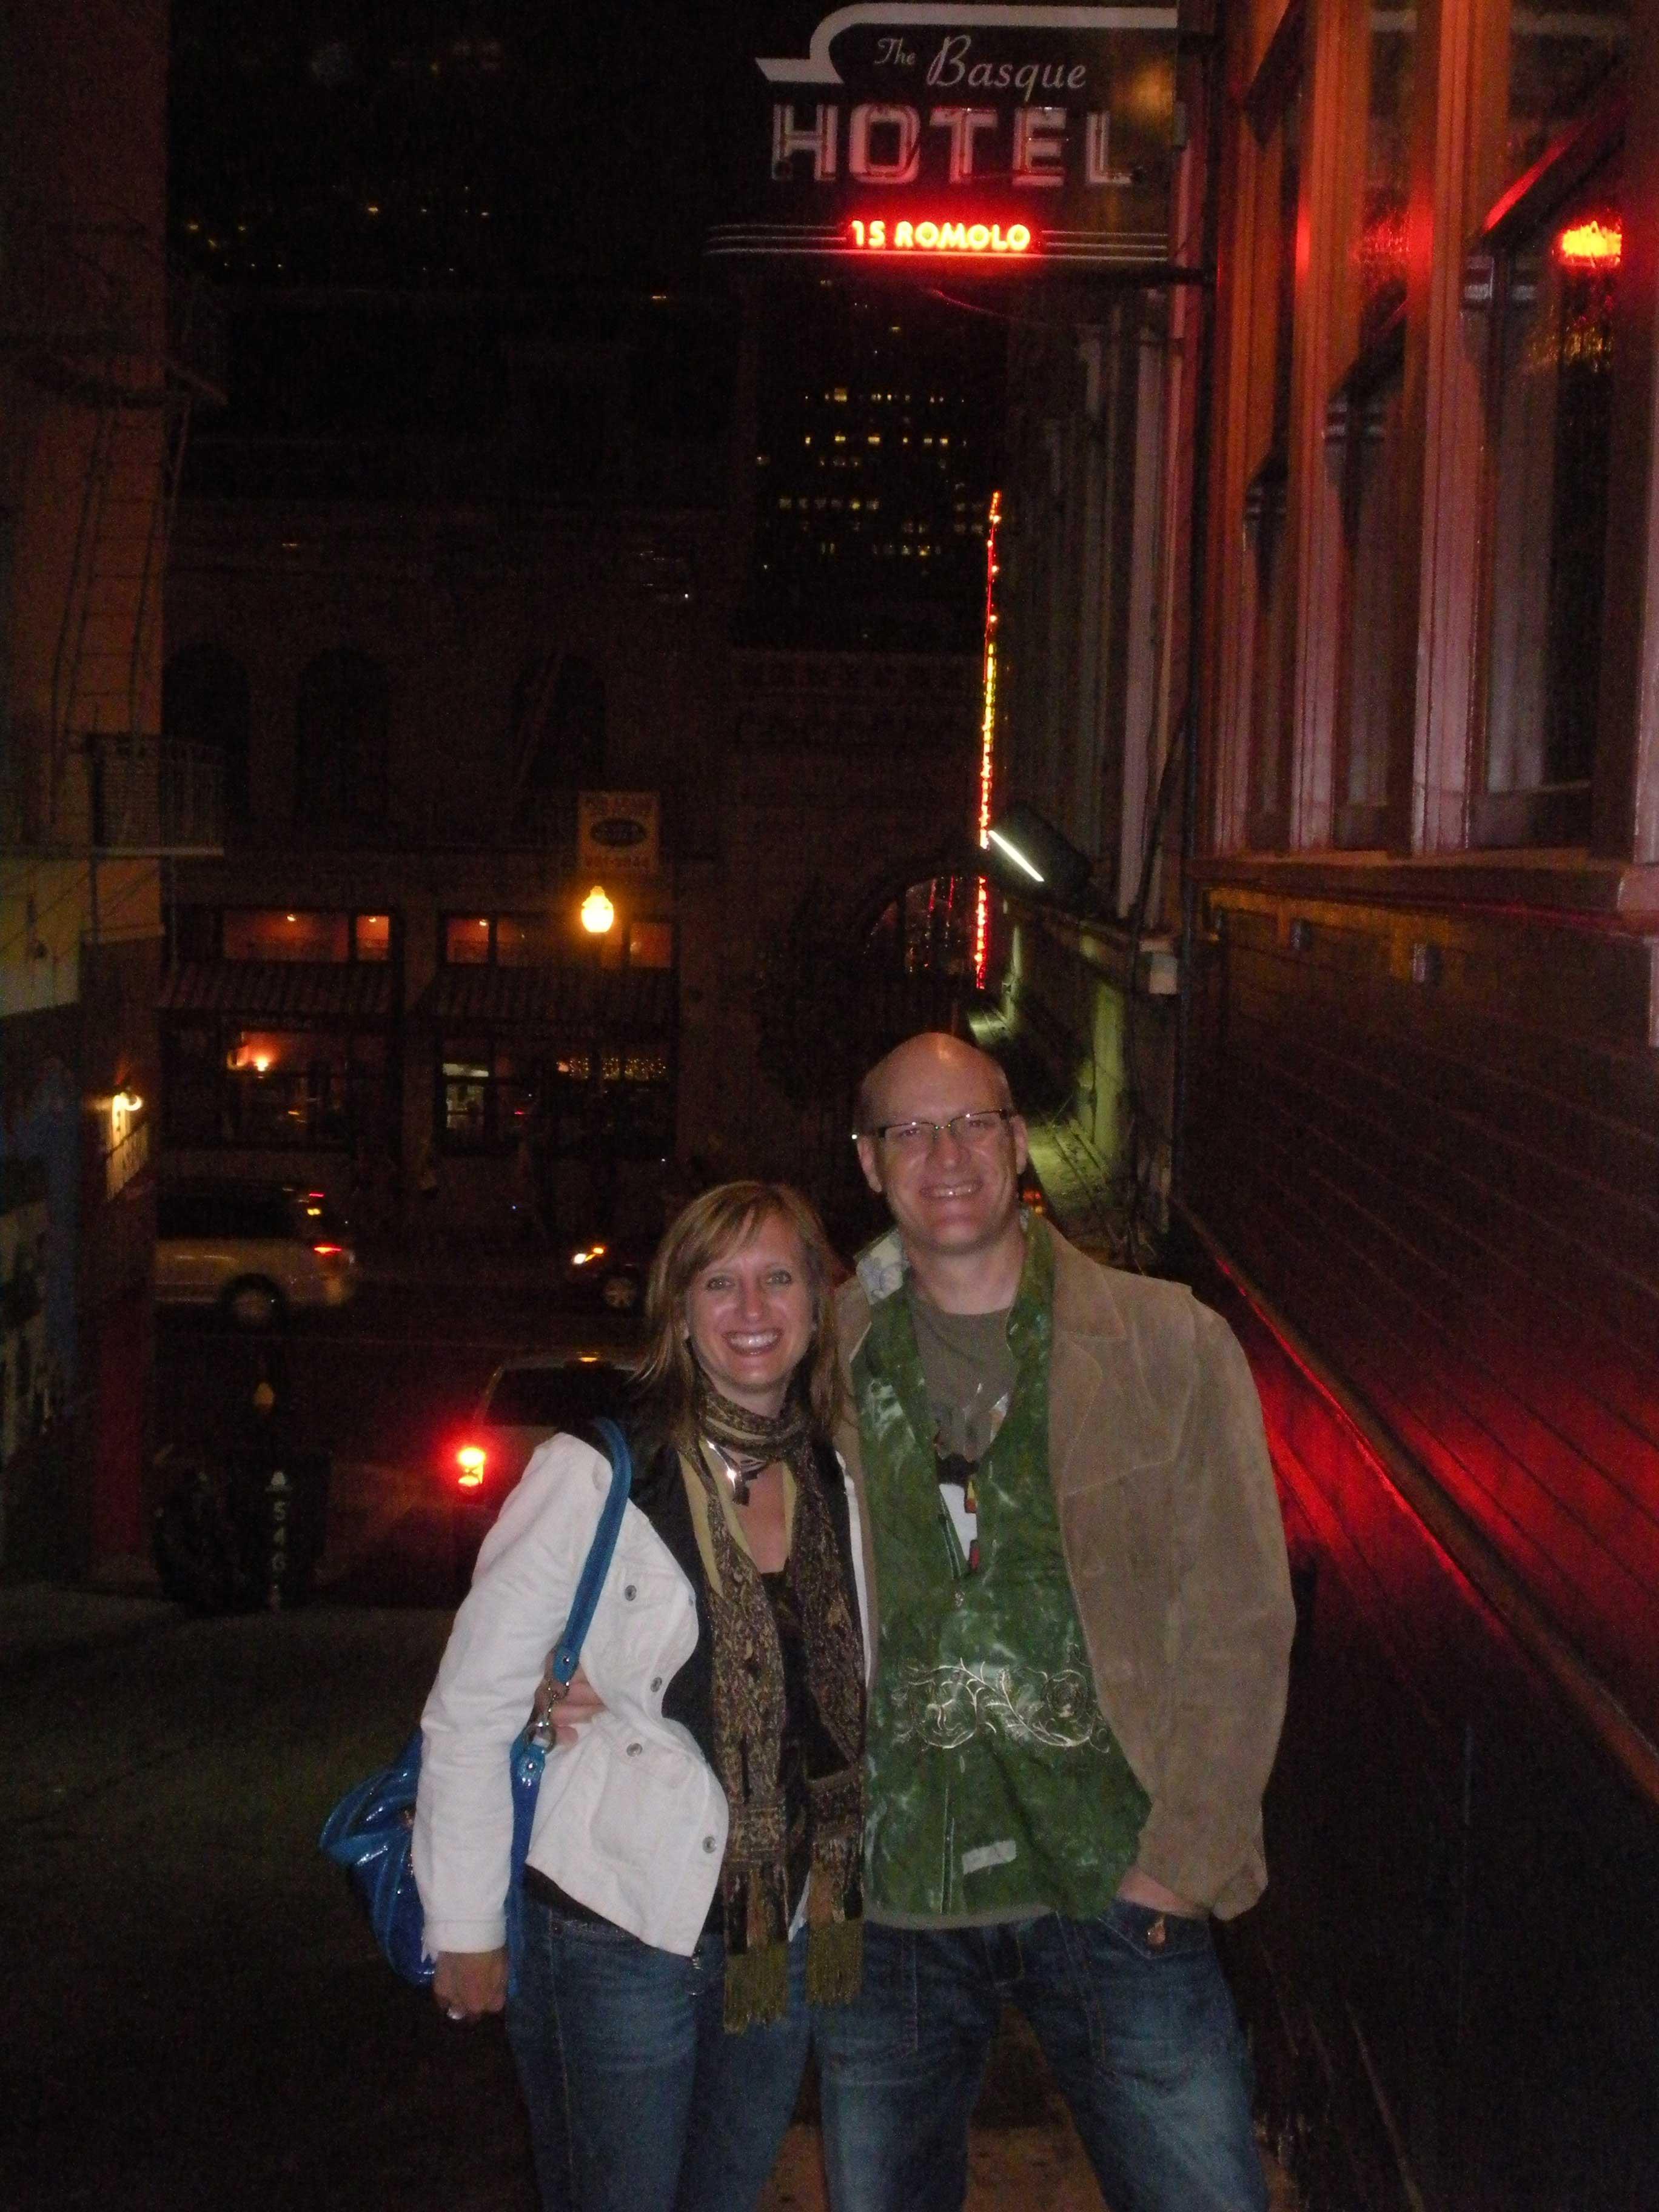 Chris & Laura at the Basque Hotel at 15 Romolo